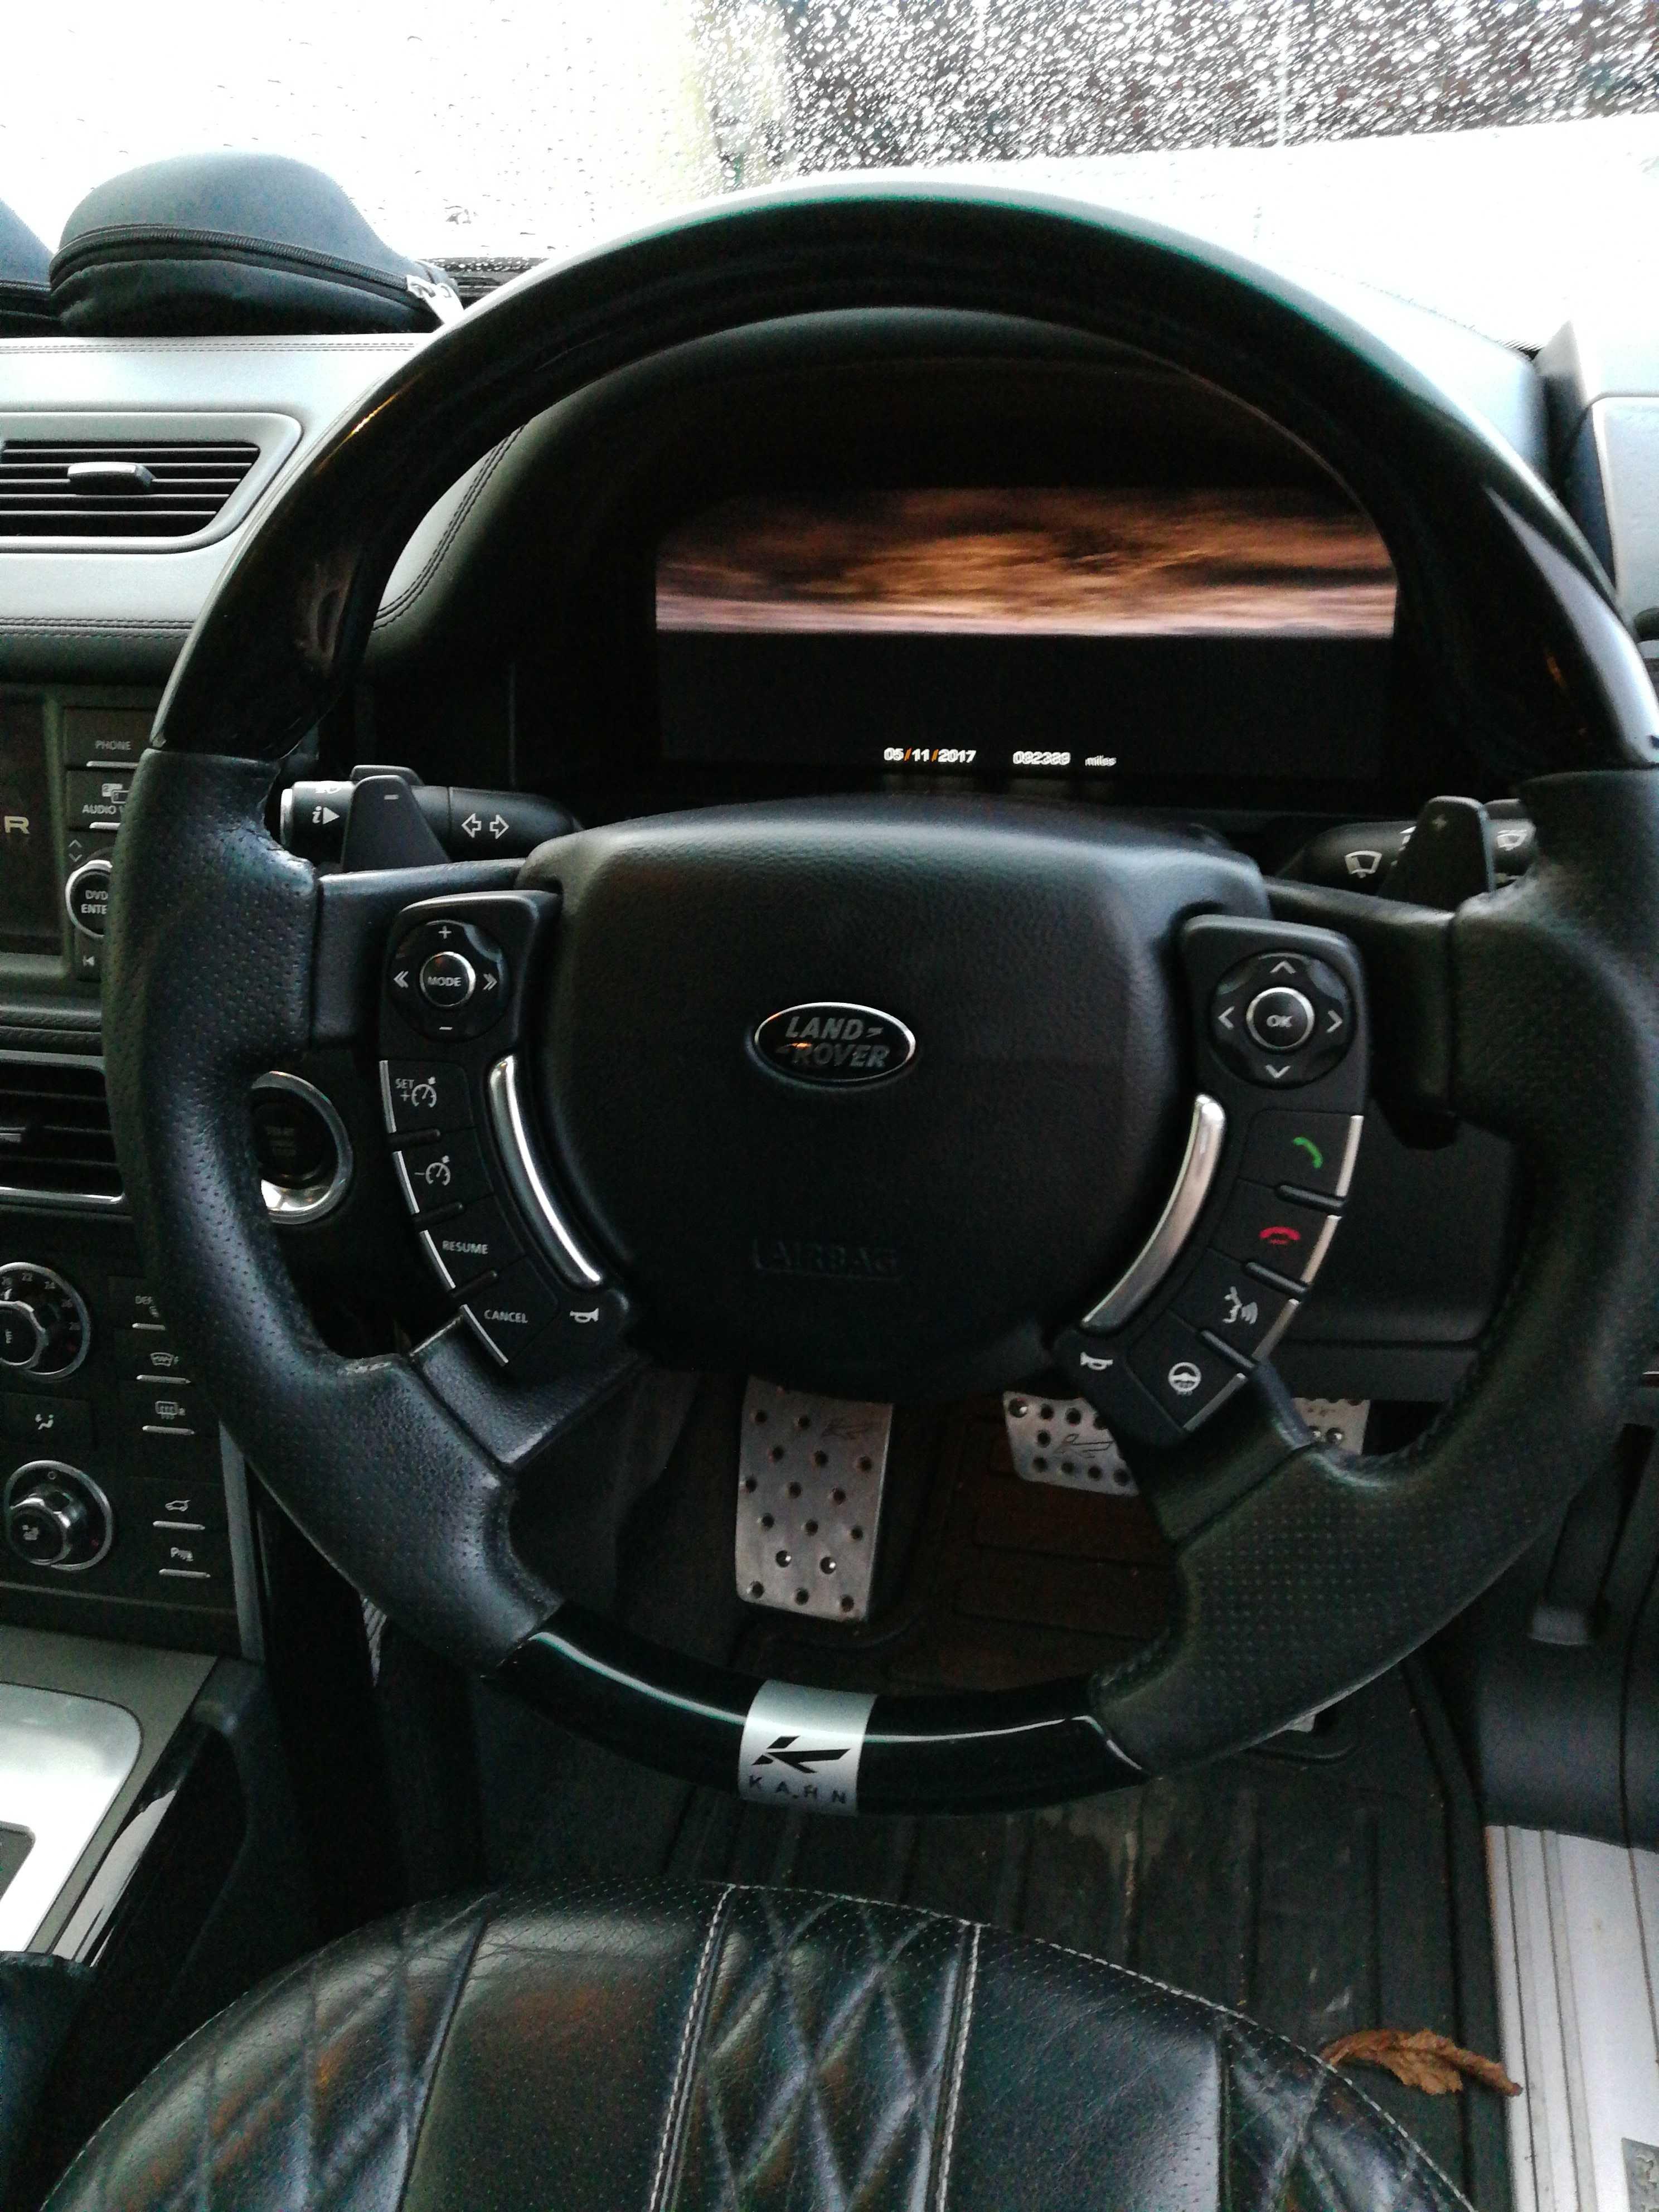 2012 L322 autobiography heated Kahn steering wheel issue